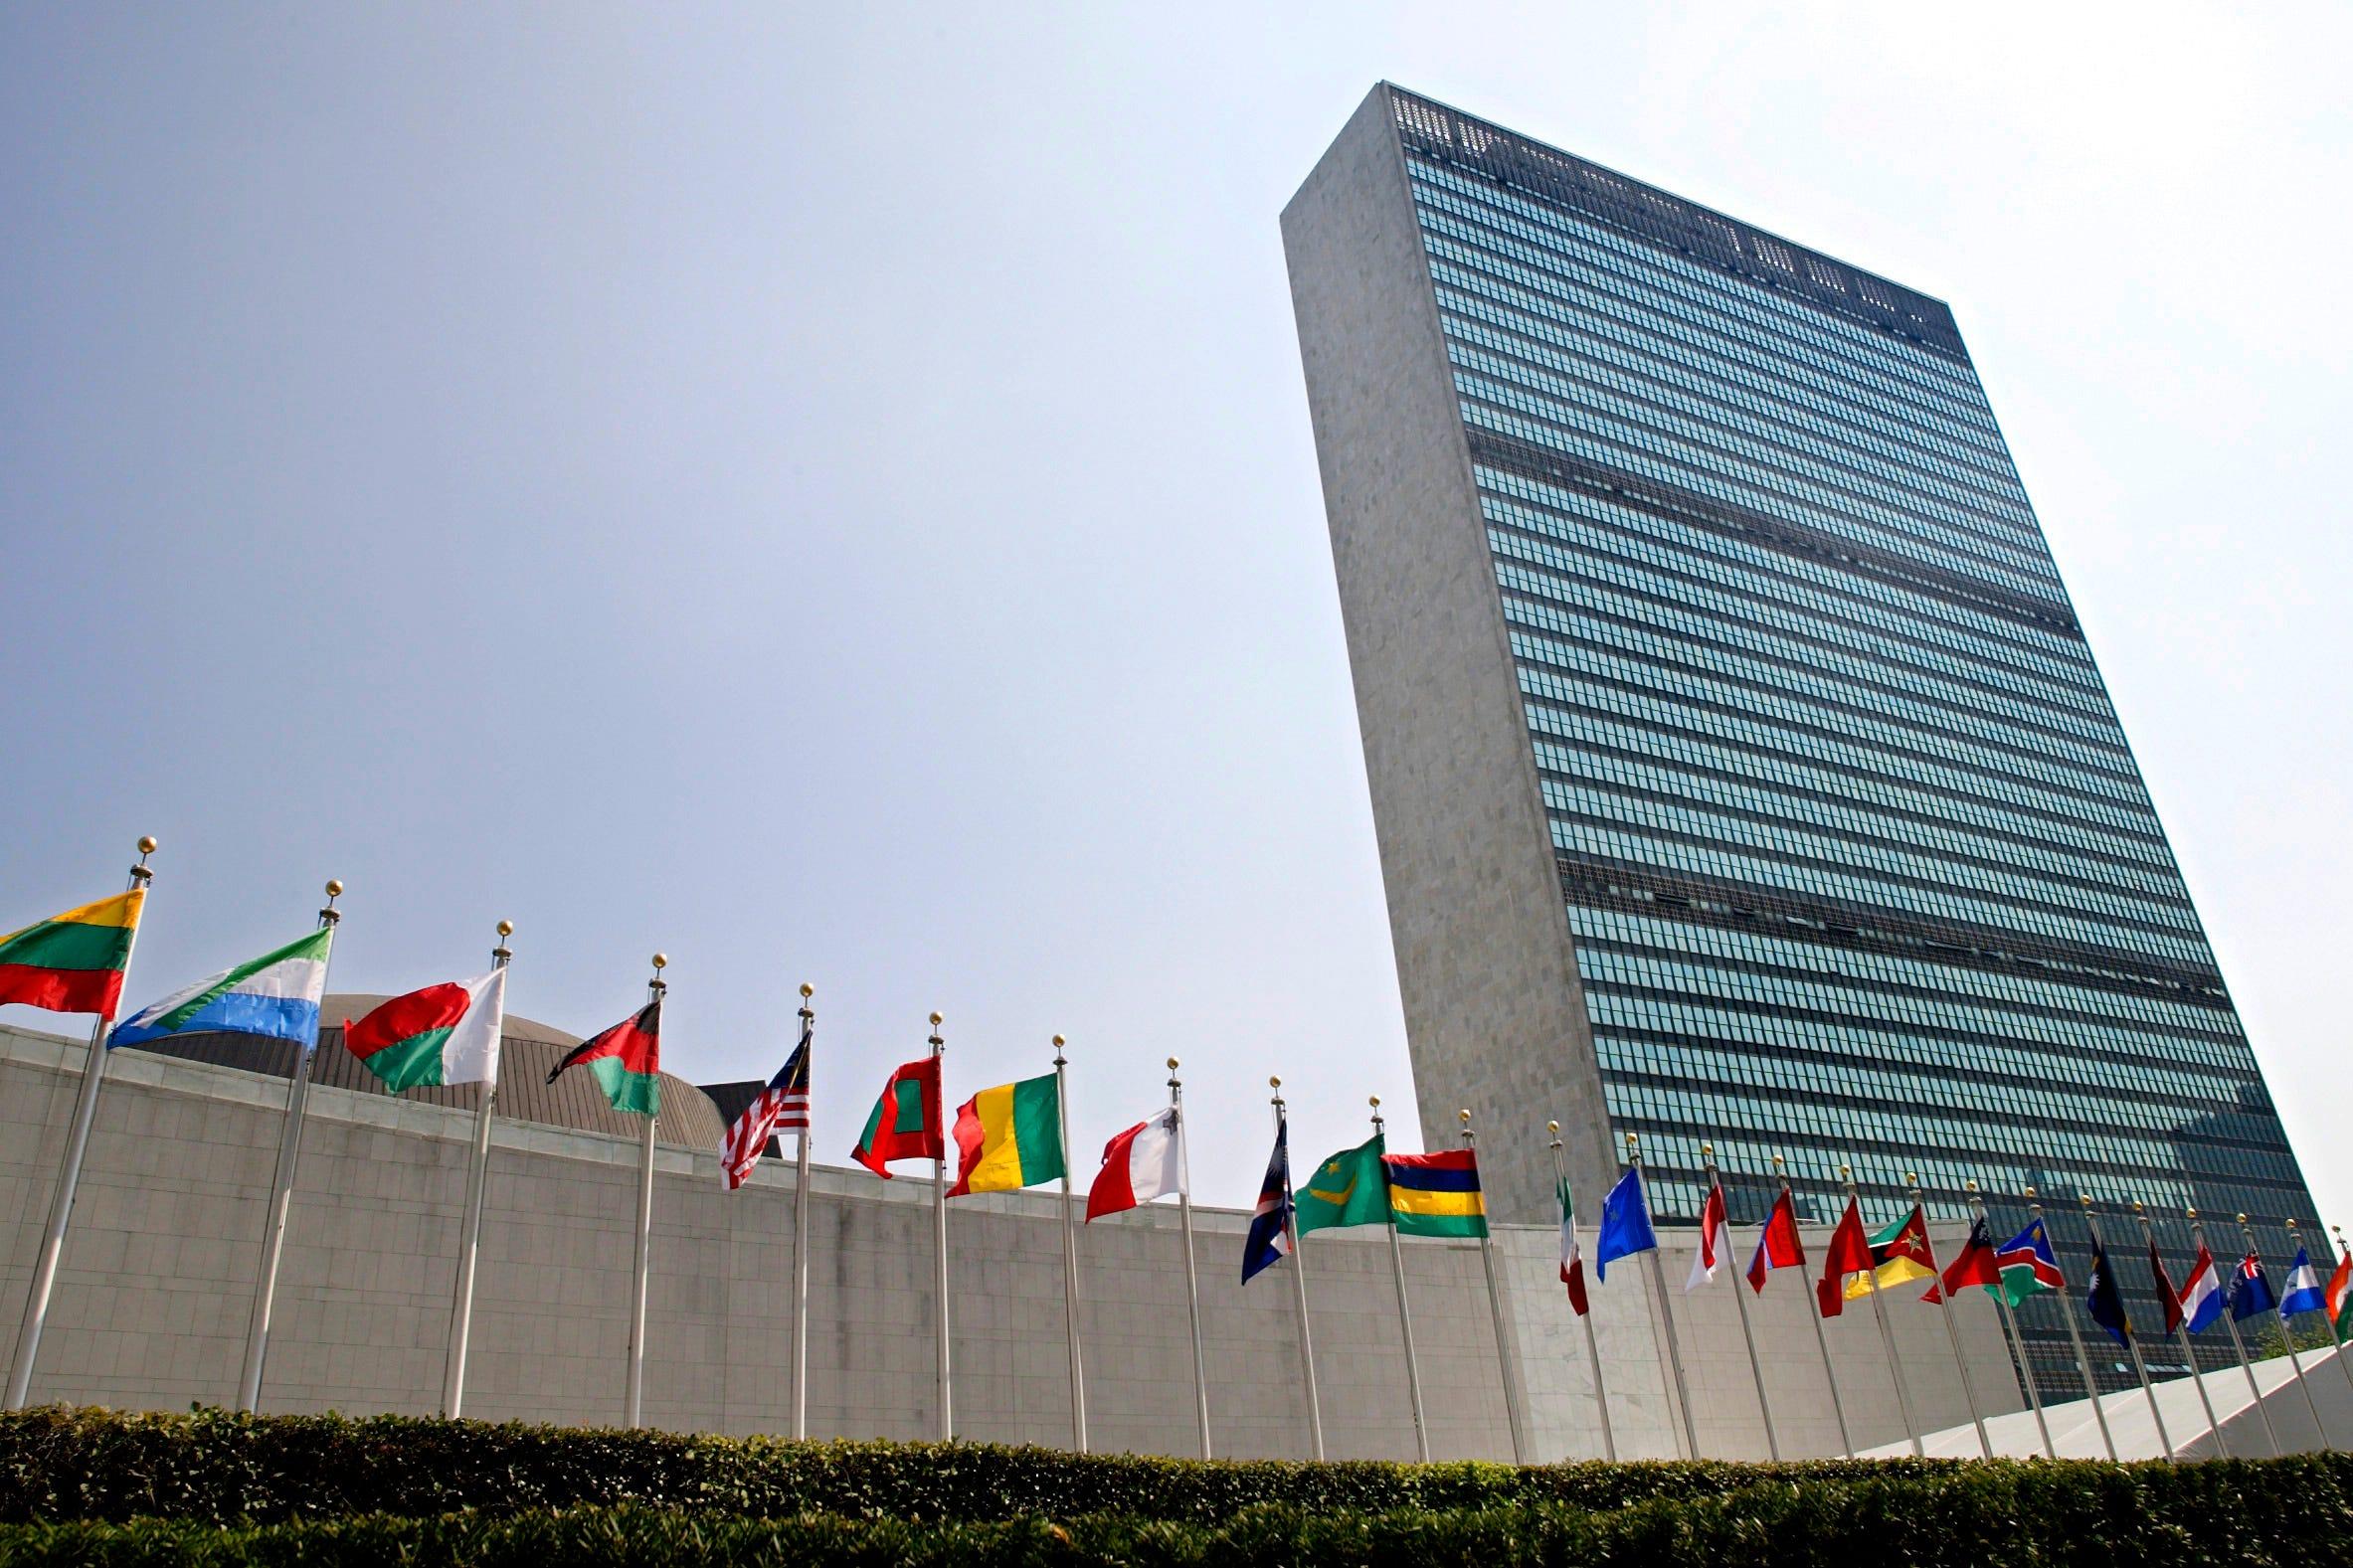 Sickening  display of hate: Why world leaders should boycott U.N. s Durban event